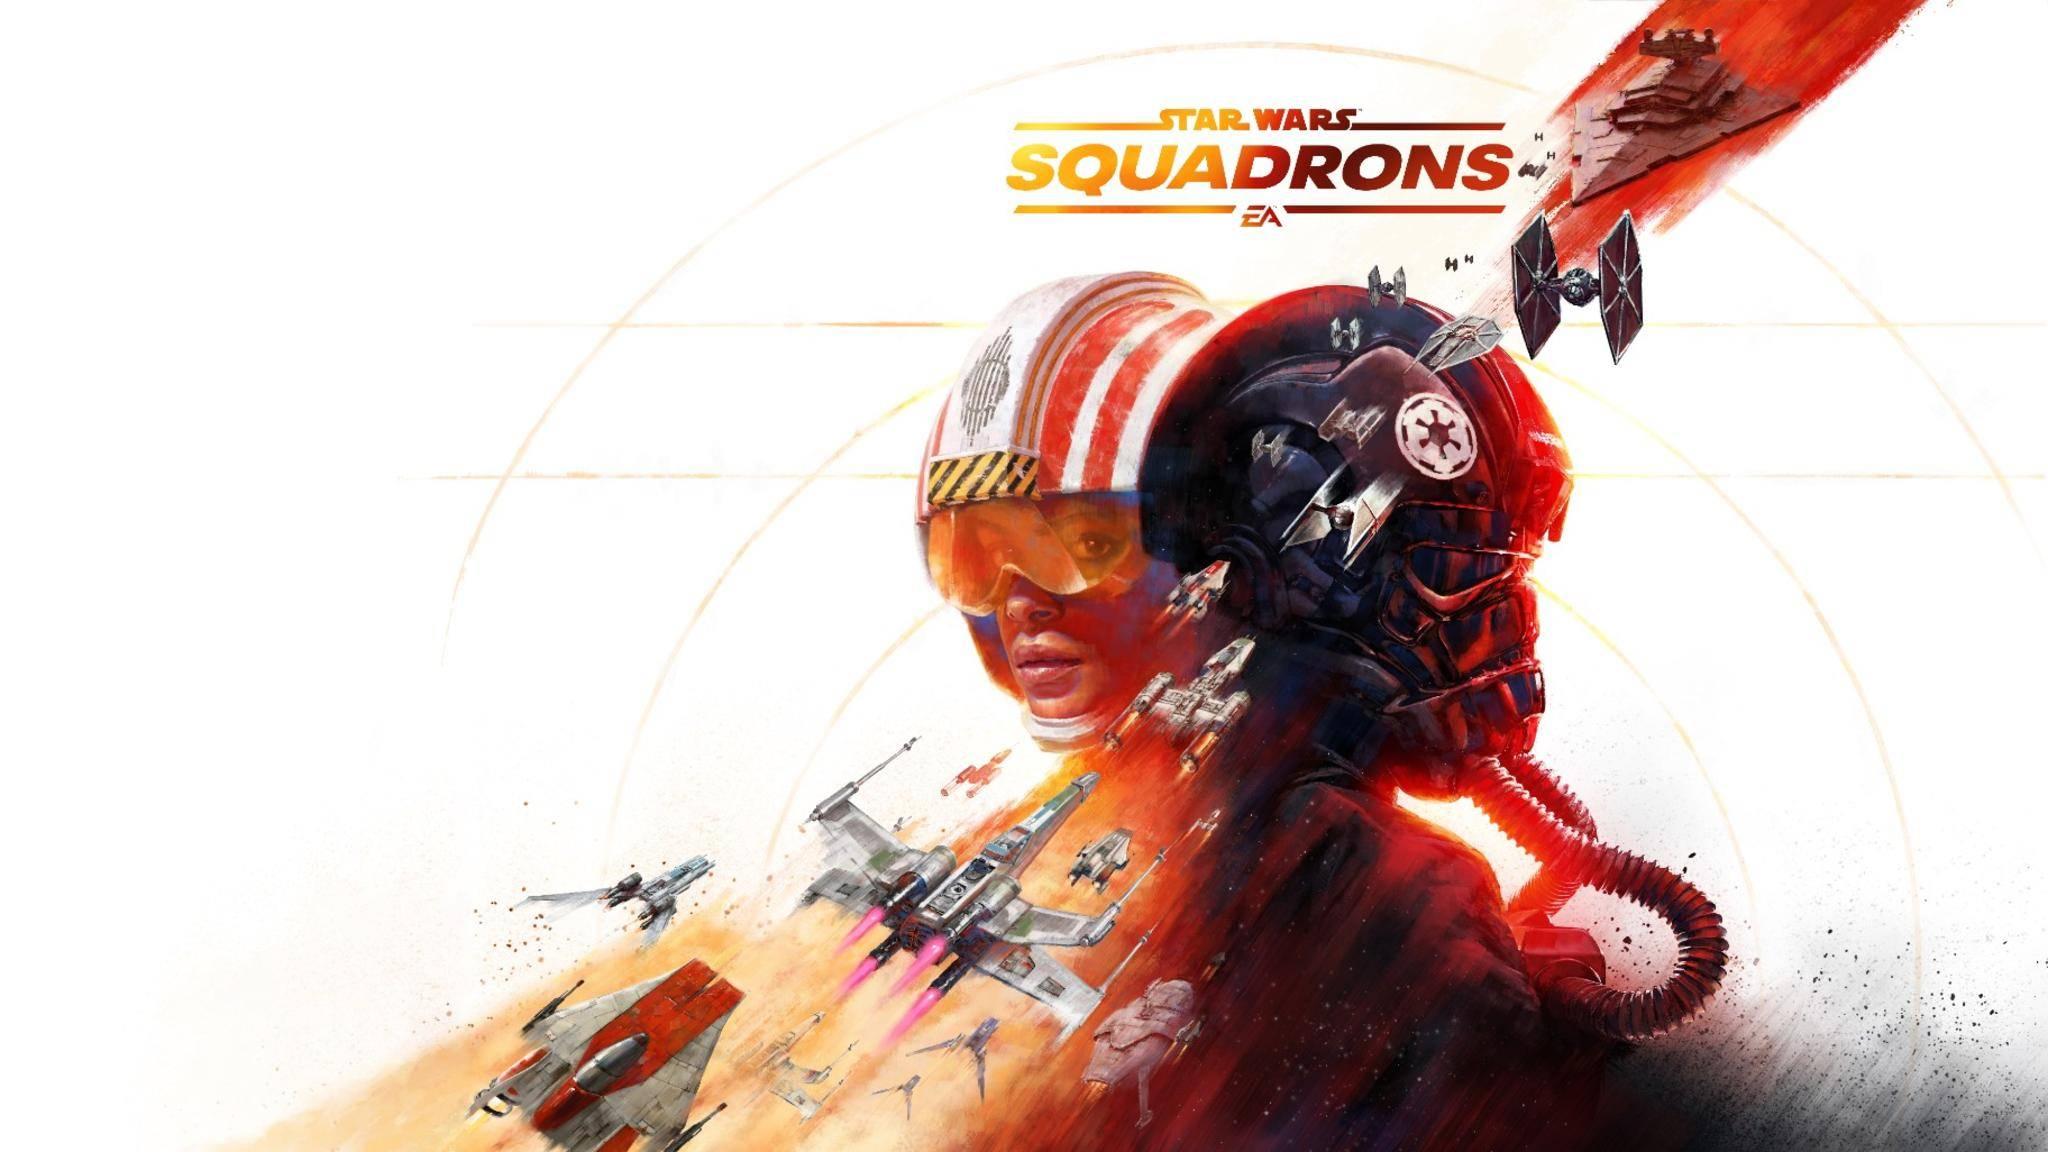 star-wars-squadrons-artwork